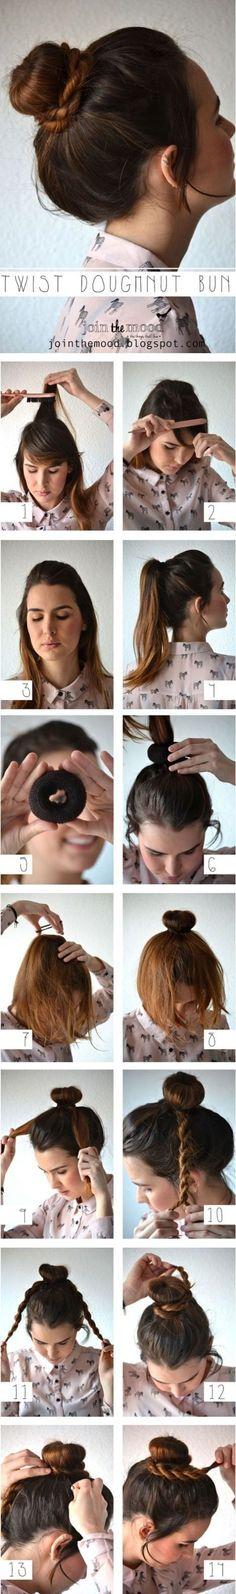 Sock or Dough-nut Bun with braids – Step By Step Hair Tutorial